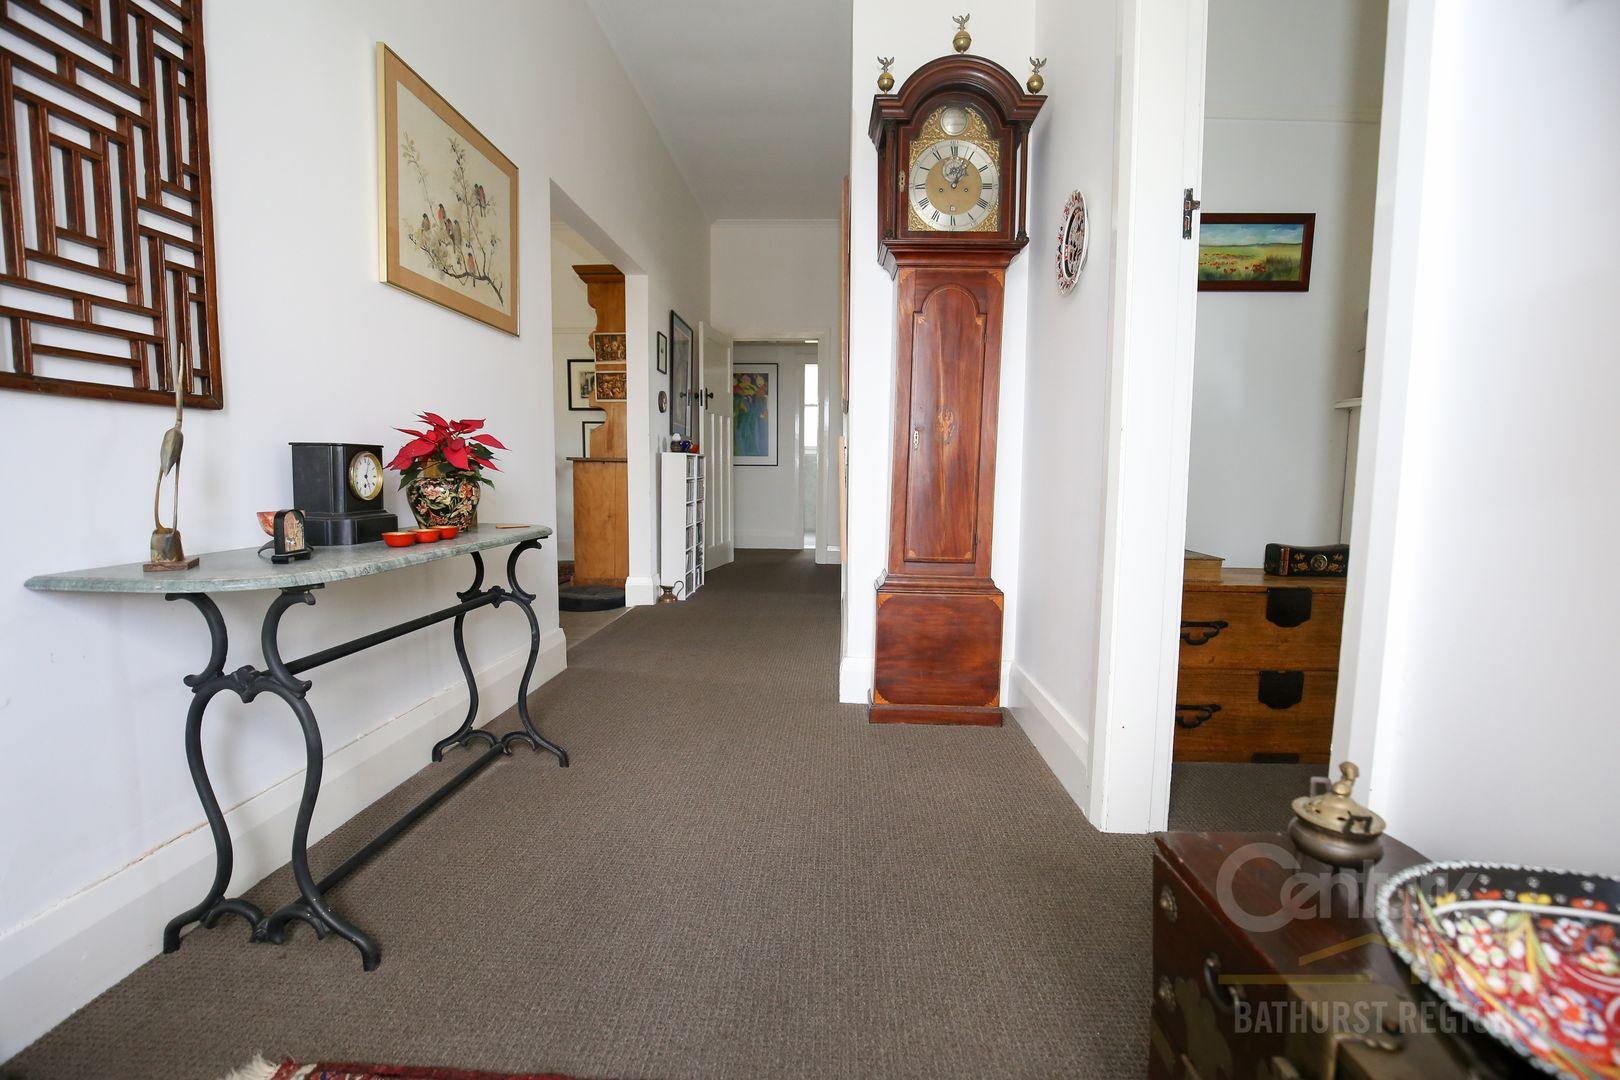 4 Clements Street, Bathurst NSW 2795, Image 1